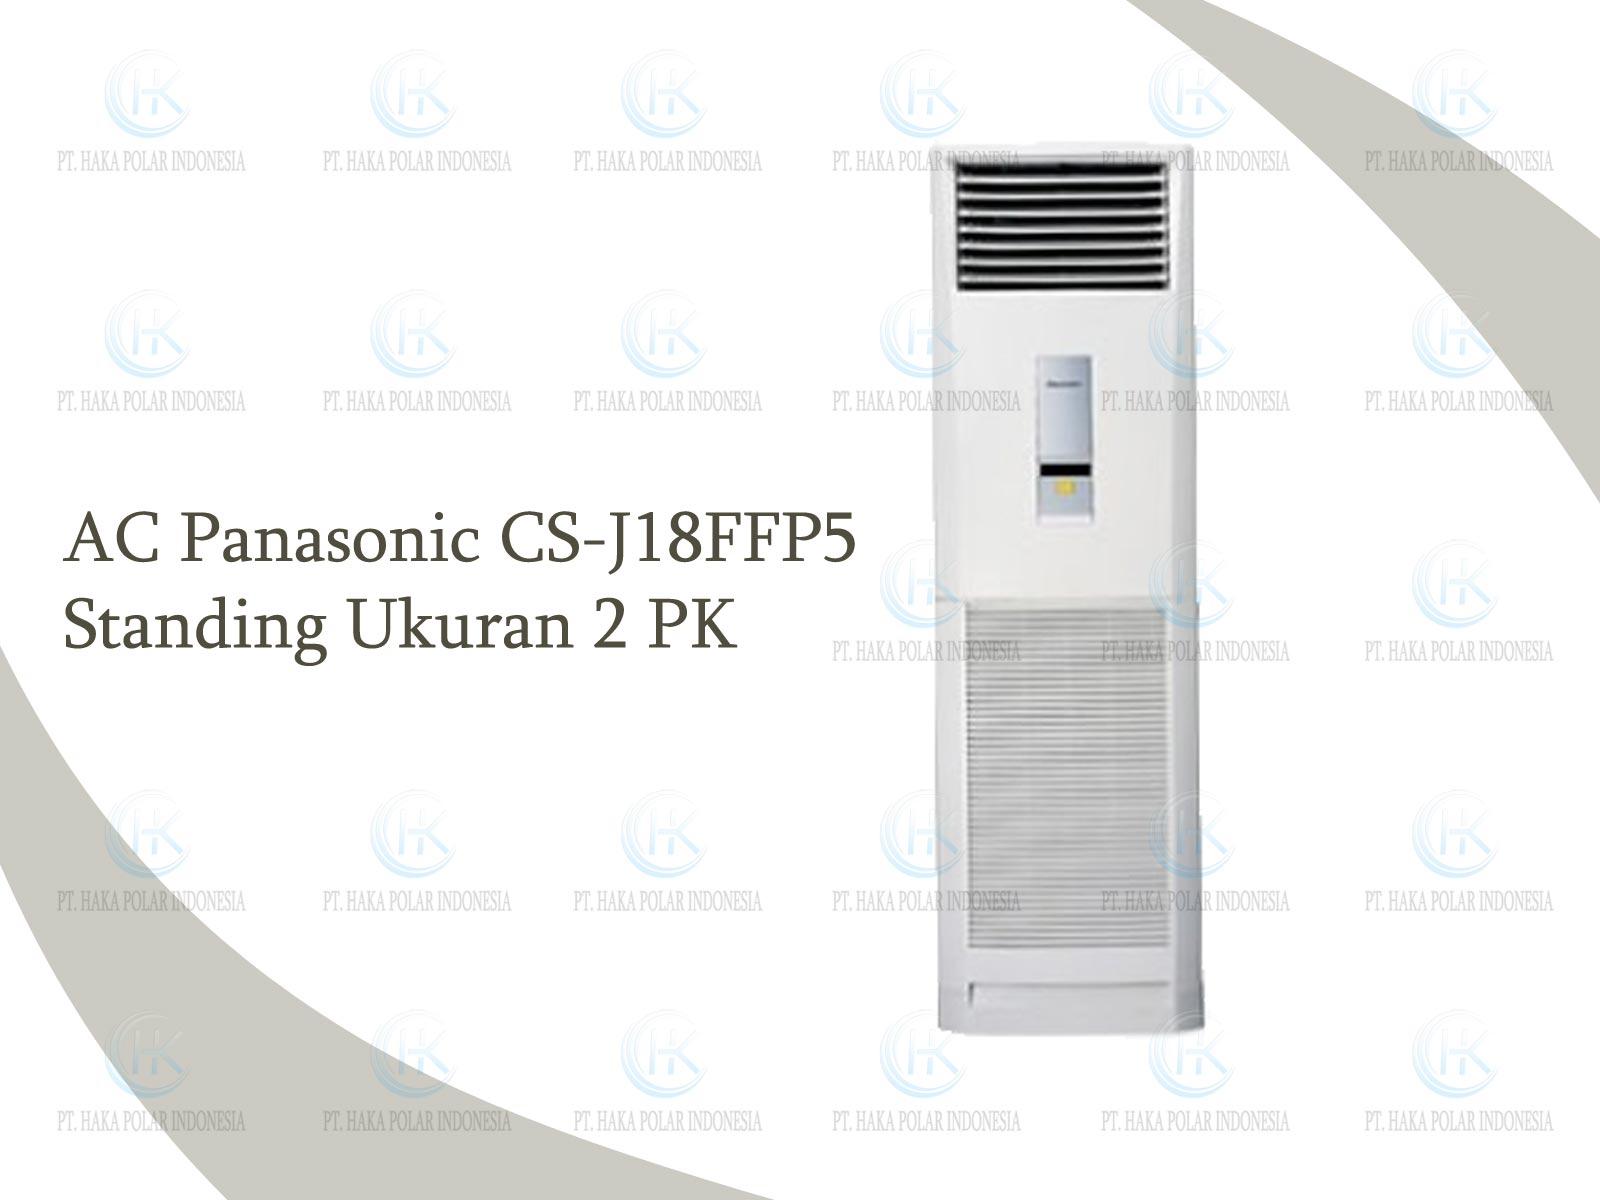 Jual AC Panasonic CS-J18FFP5 2 PK Floor Standing R410a